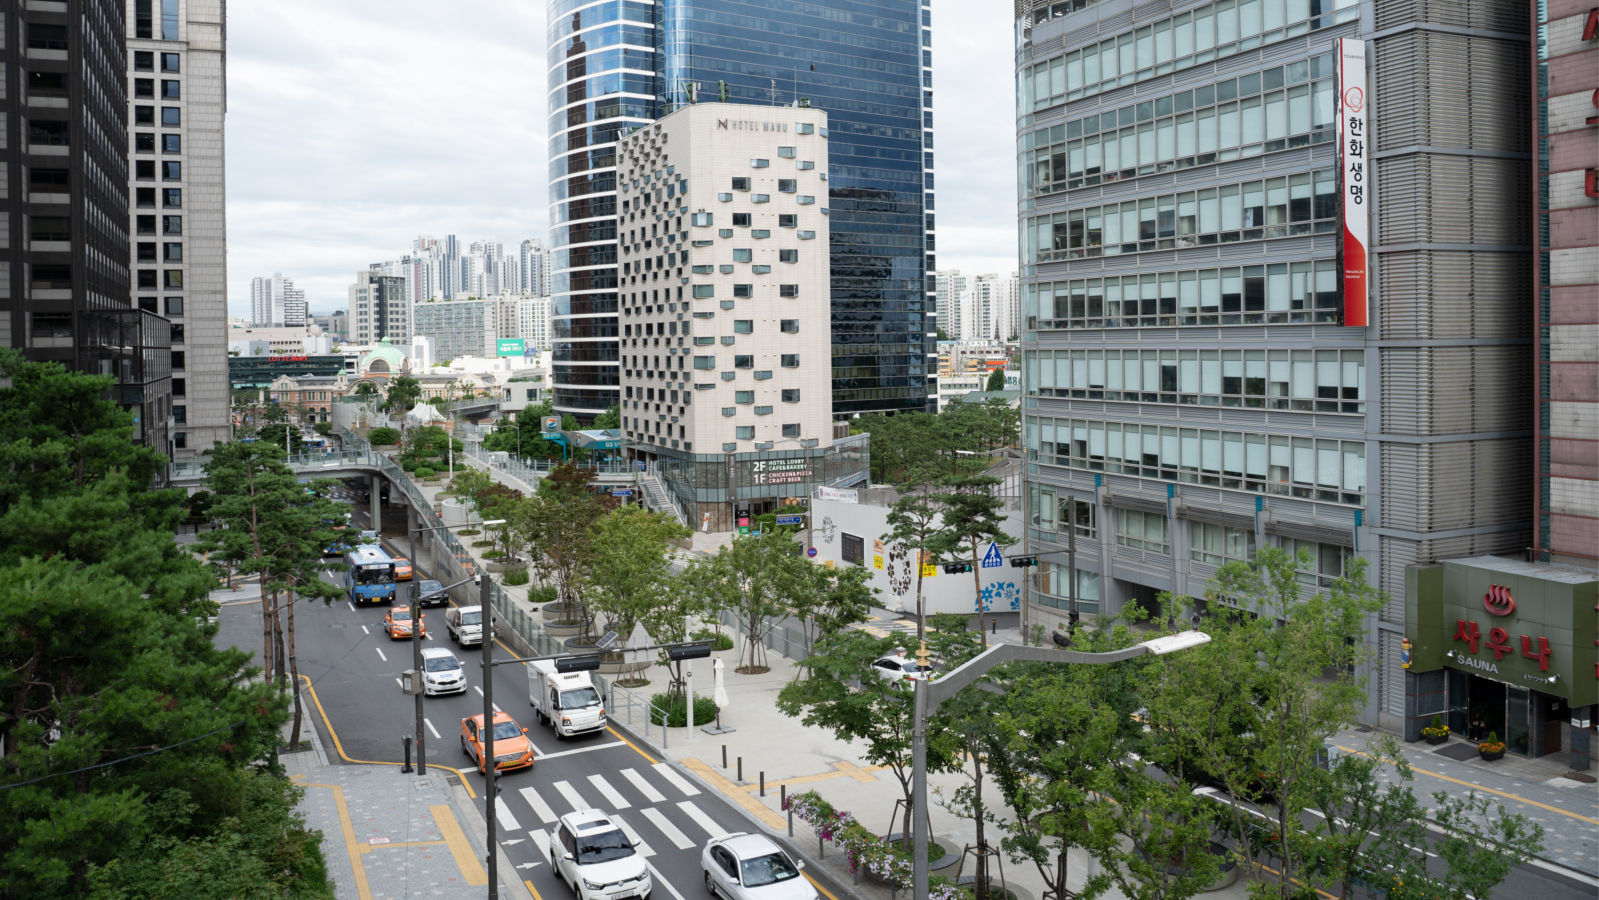 maak.space inrichting buitenruimte Seoul